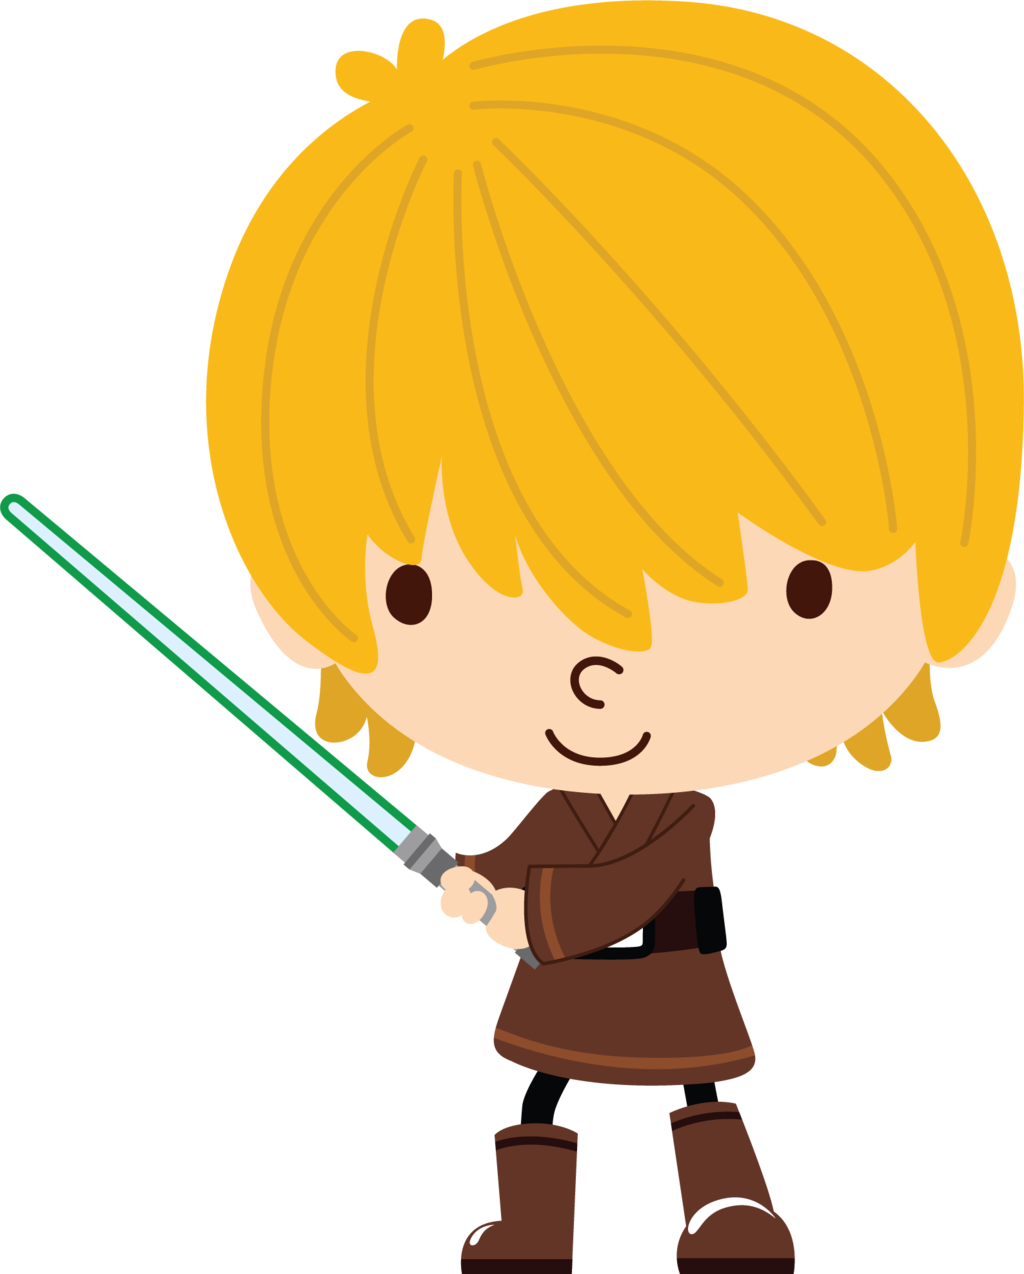 clipart free library Luke Skywalker by Chrispix